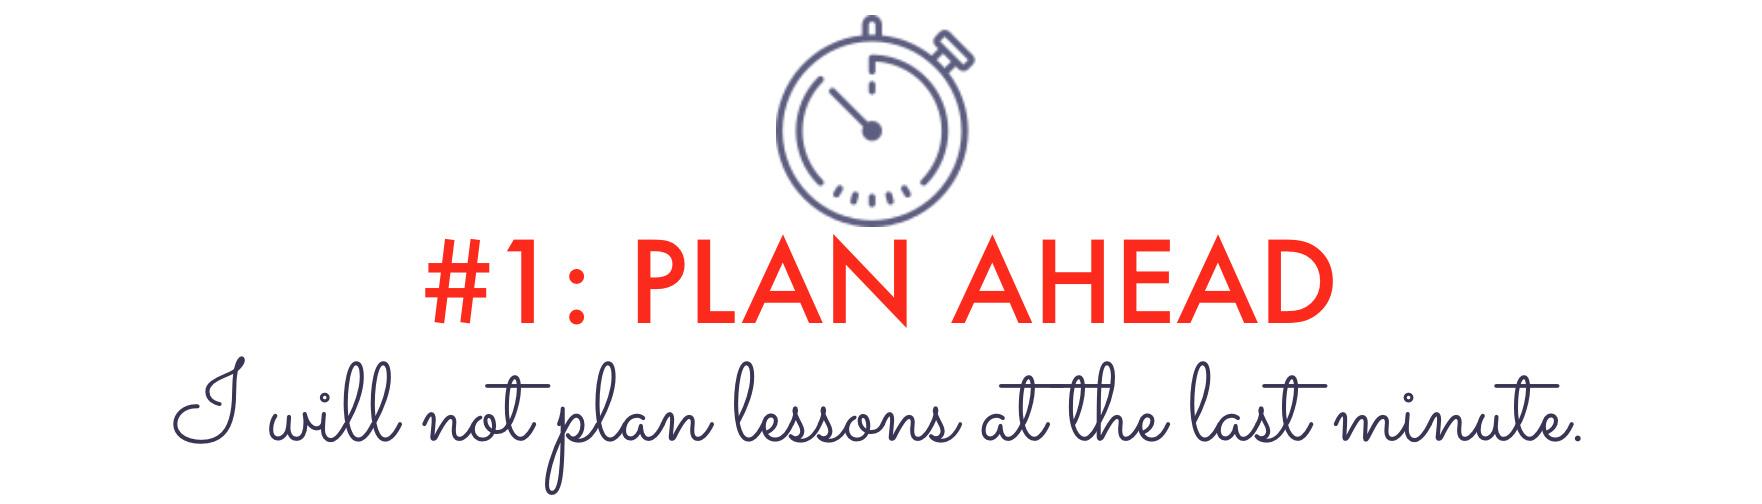 TEFL-Resolutions-1-Plan-Ahead.jpg